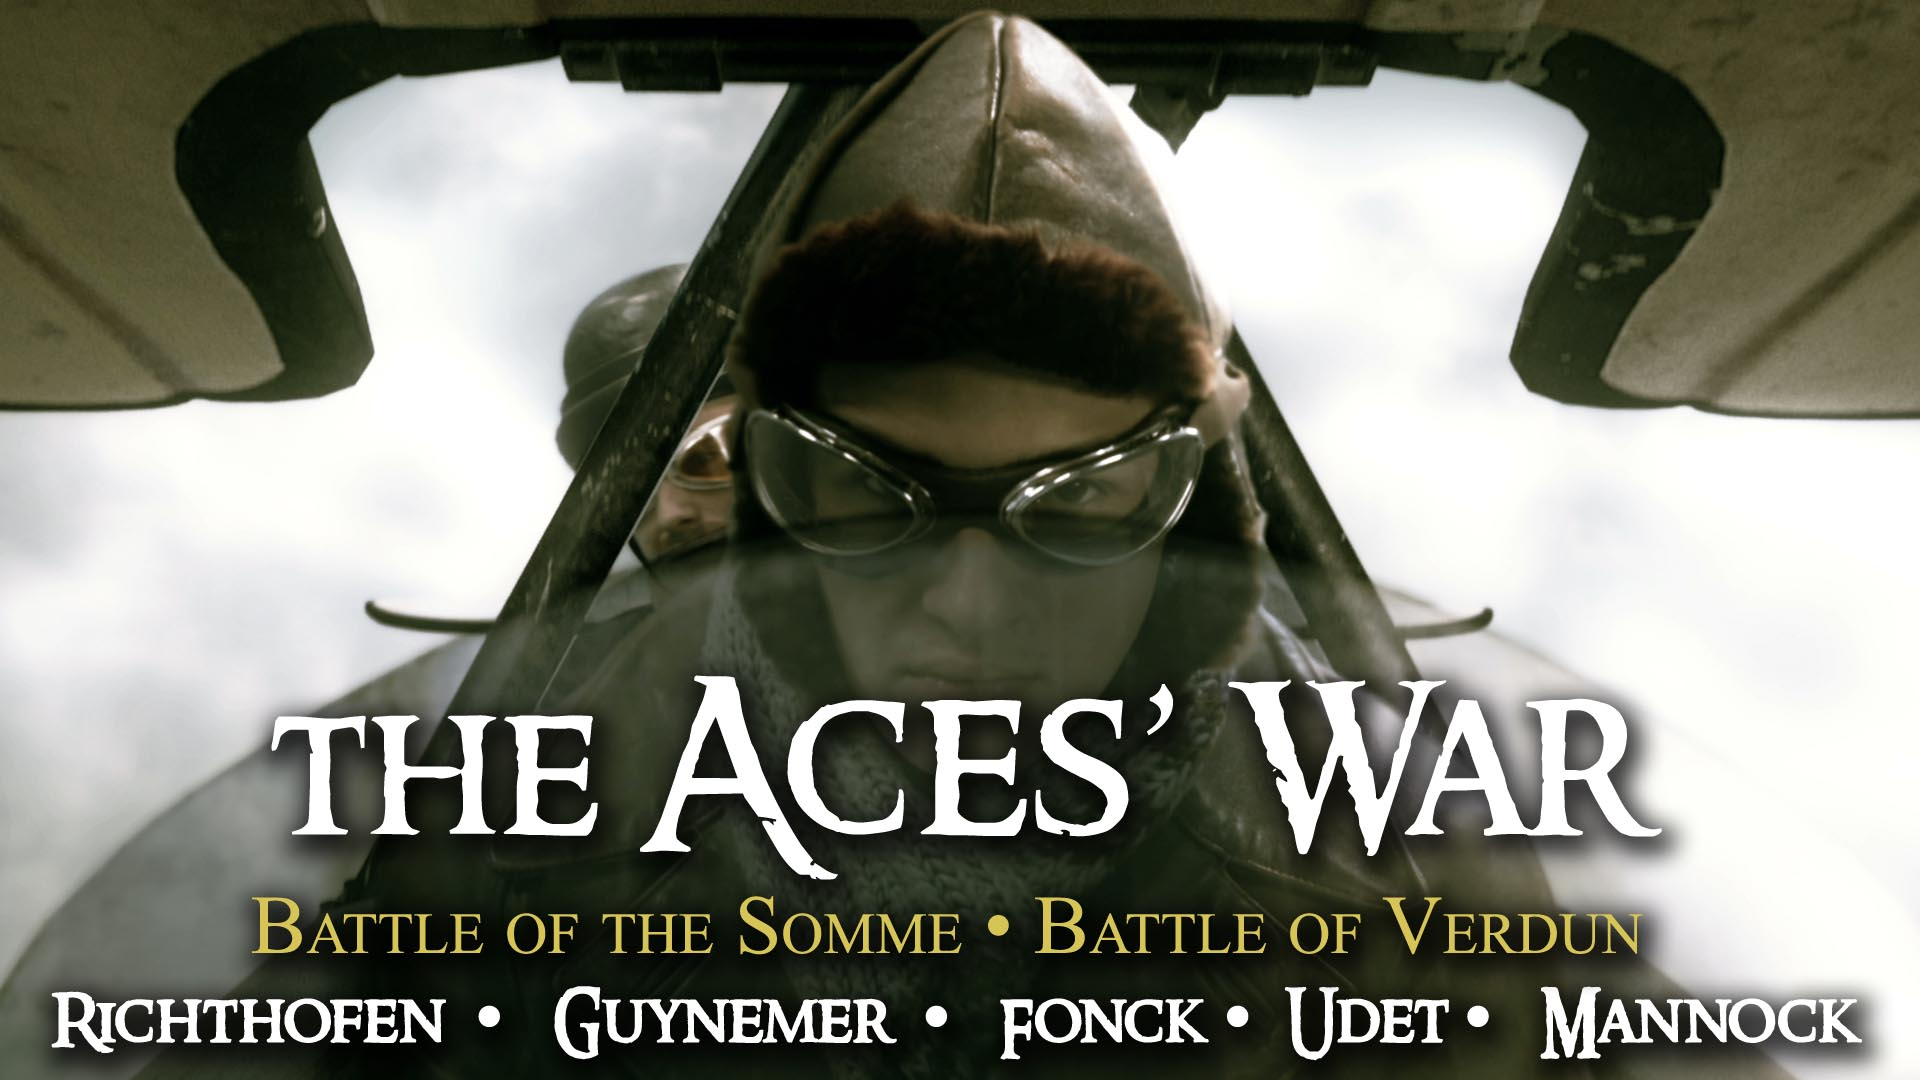 The Ace's War -